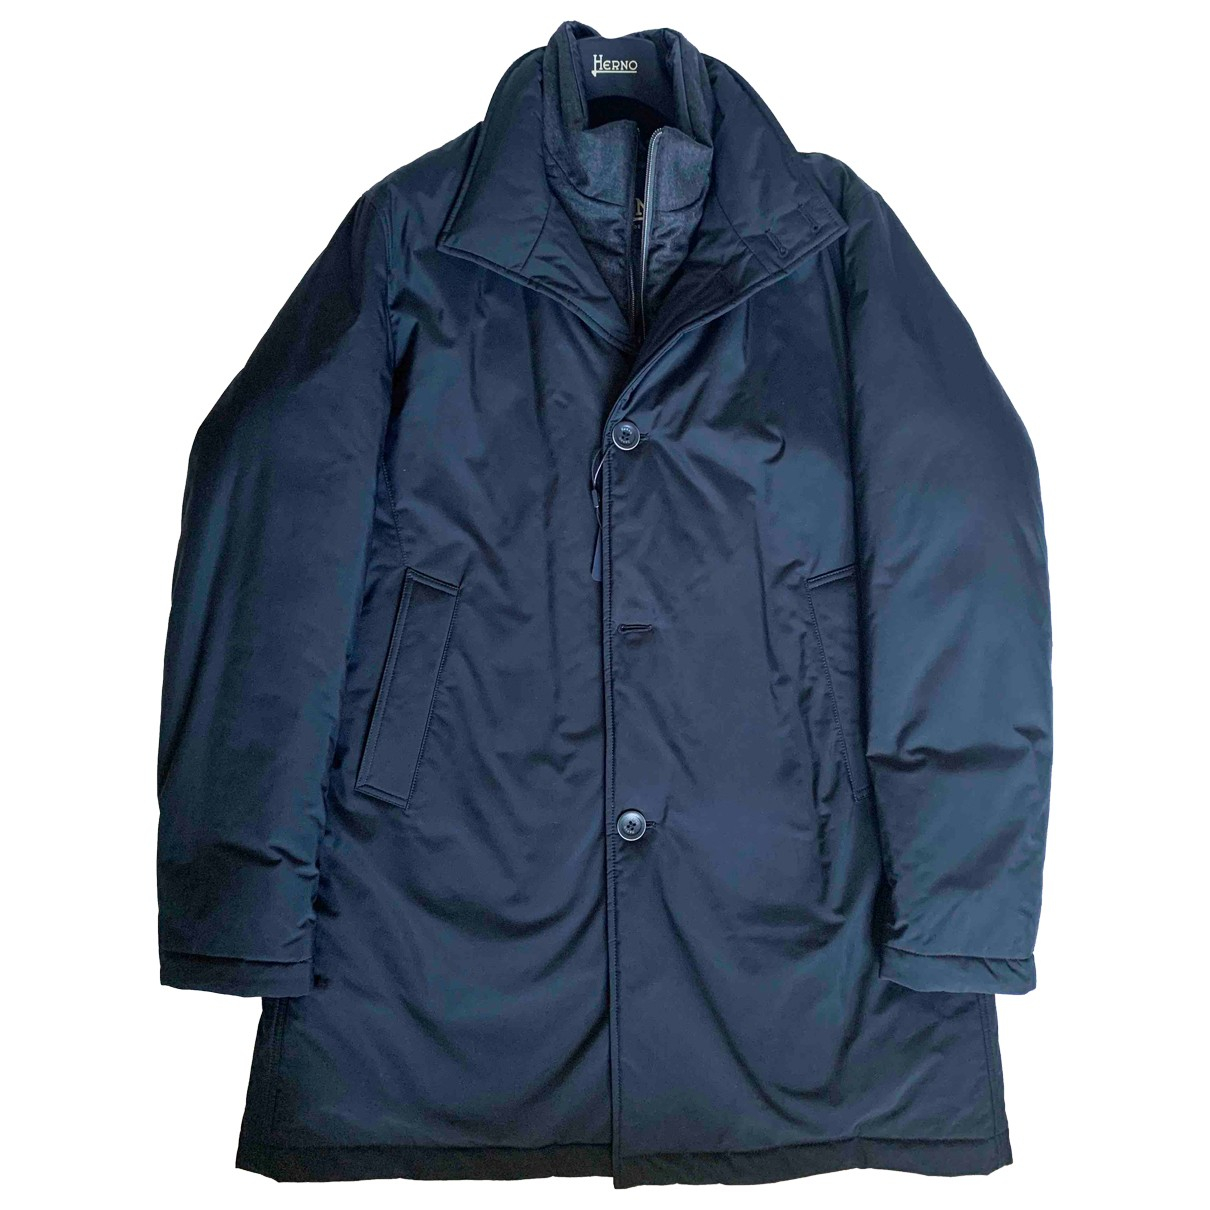 Herno \N Jacke in  Blau Polyester